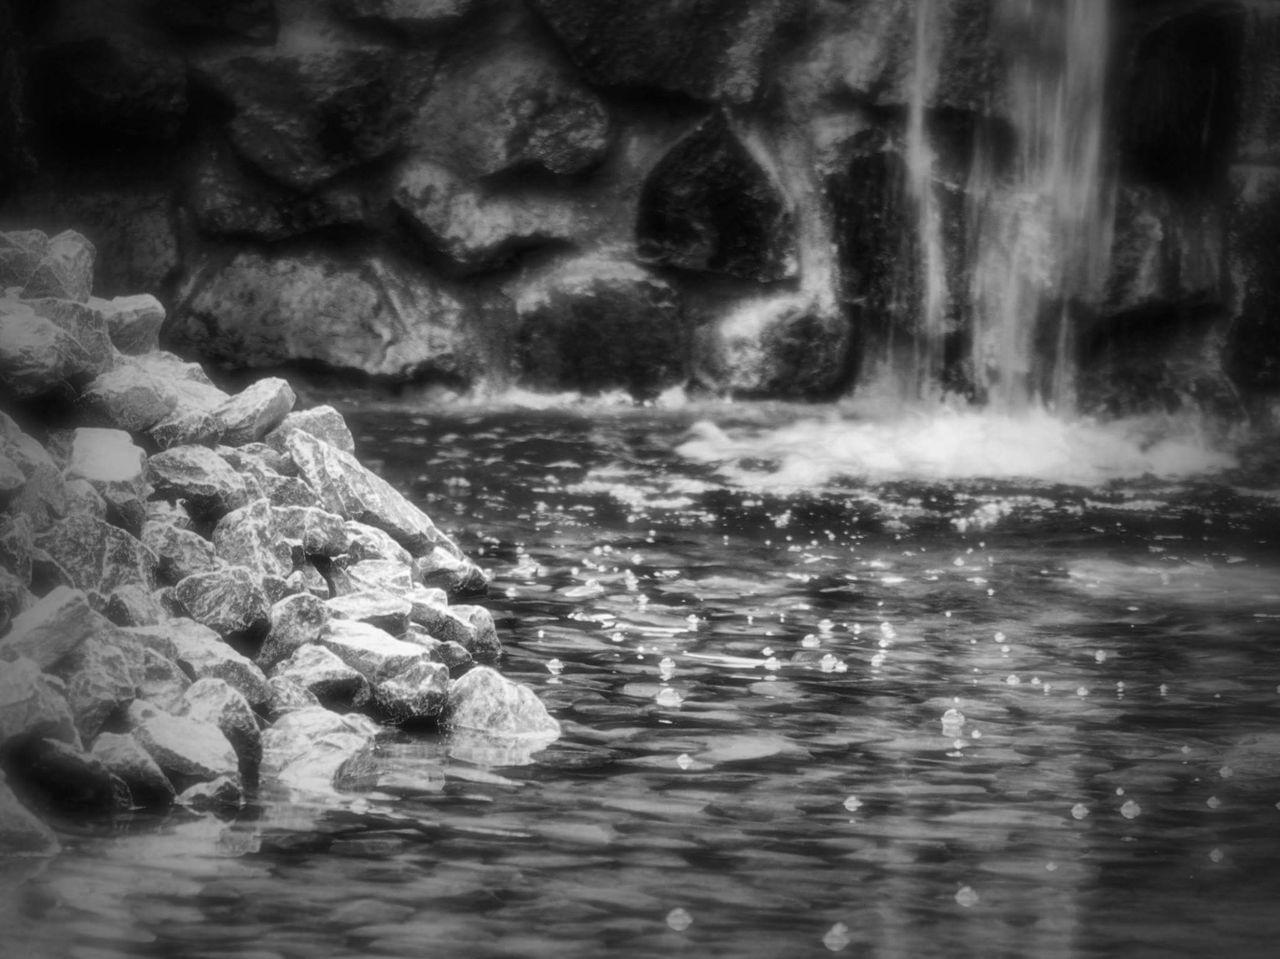 Enjoying Life Hello World Blackandwhite Blackandwhite Photography Landscape_Collection See Teich Olympus Olympus OM-D E-M5